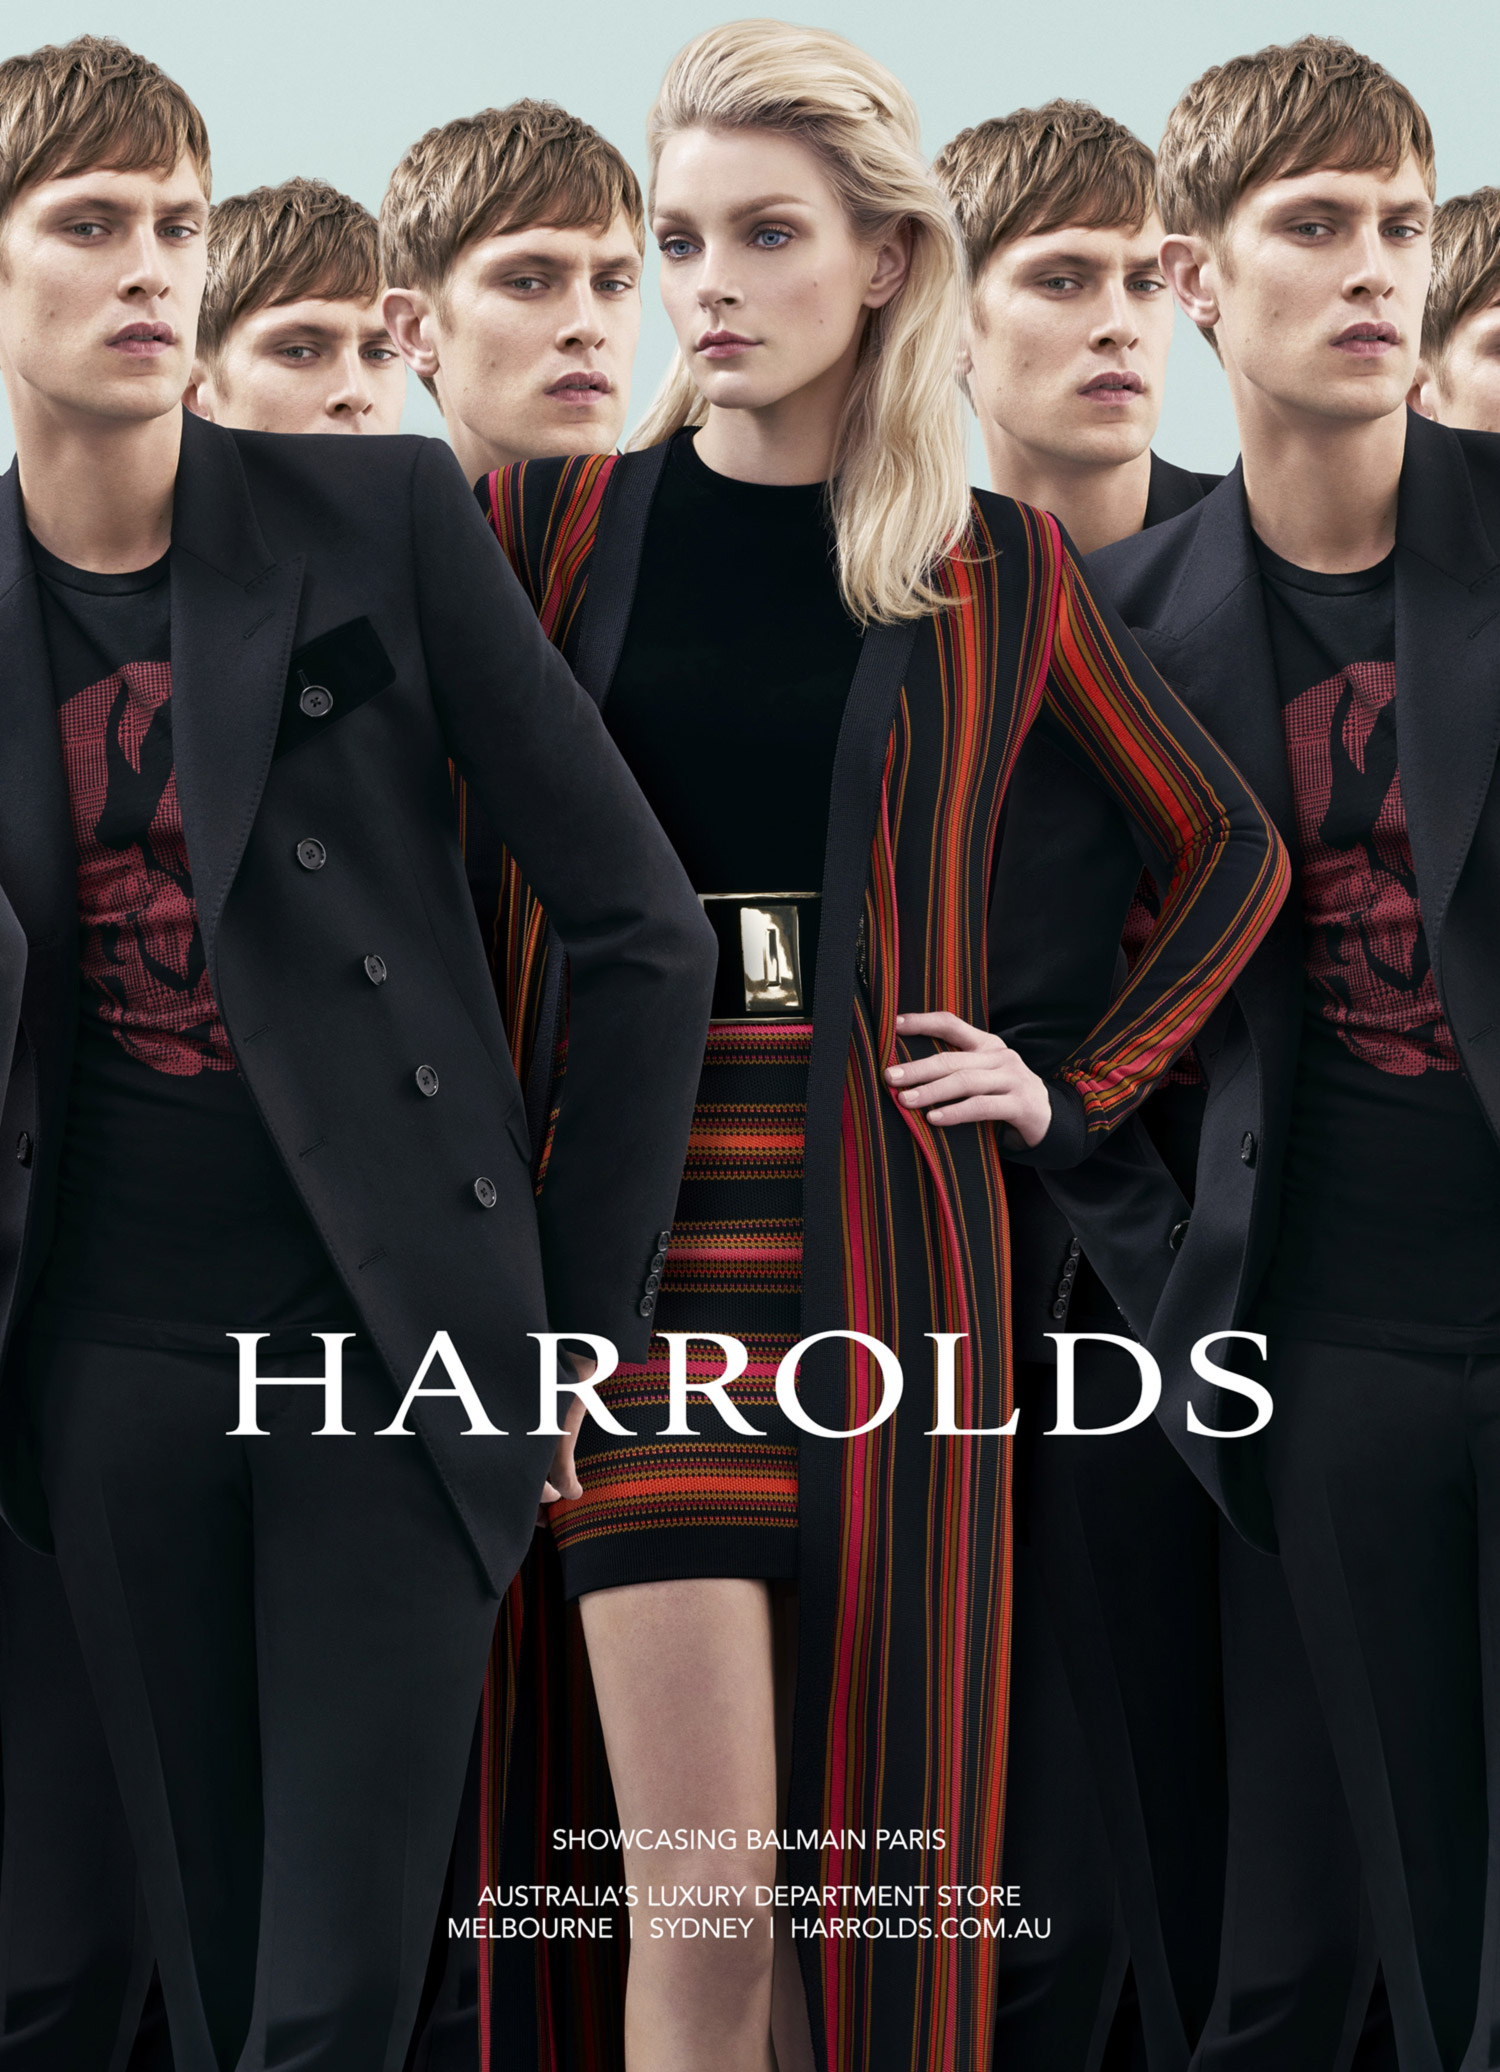 Harrolds_SS15_Harpers_Bazaar_Revised.jpg